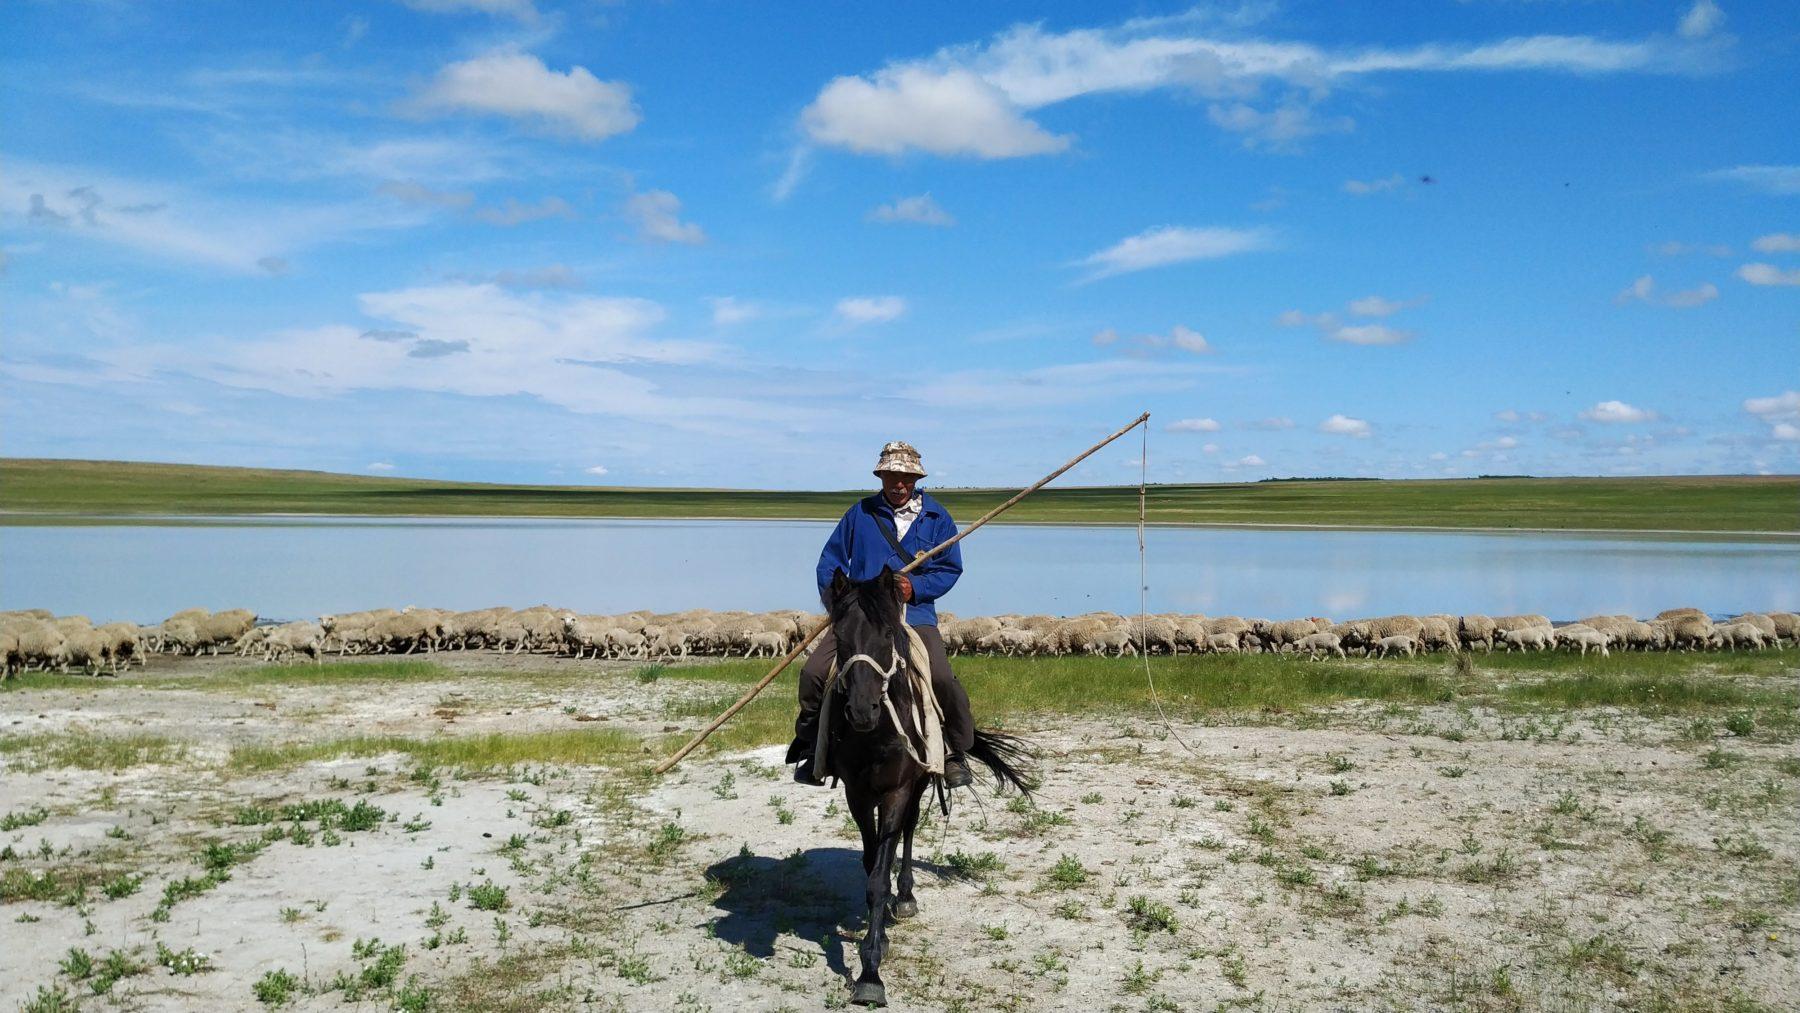 https://www.thethirdpole.net/content/uploads/2021/06/Landscapes-of-Dauria-Blue-Horse-12-scaled.jpg